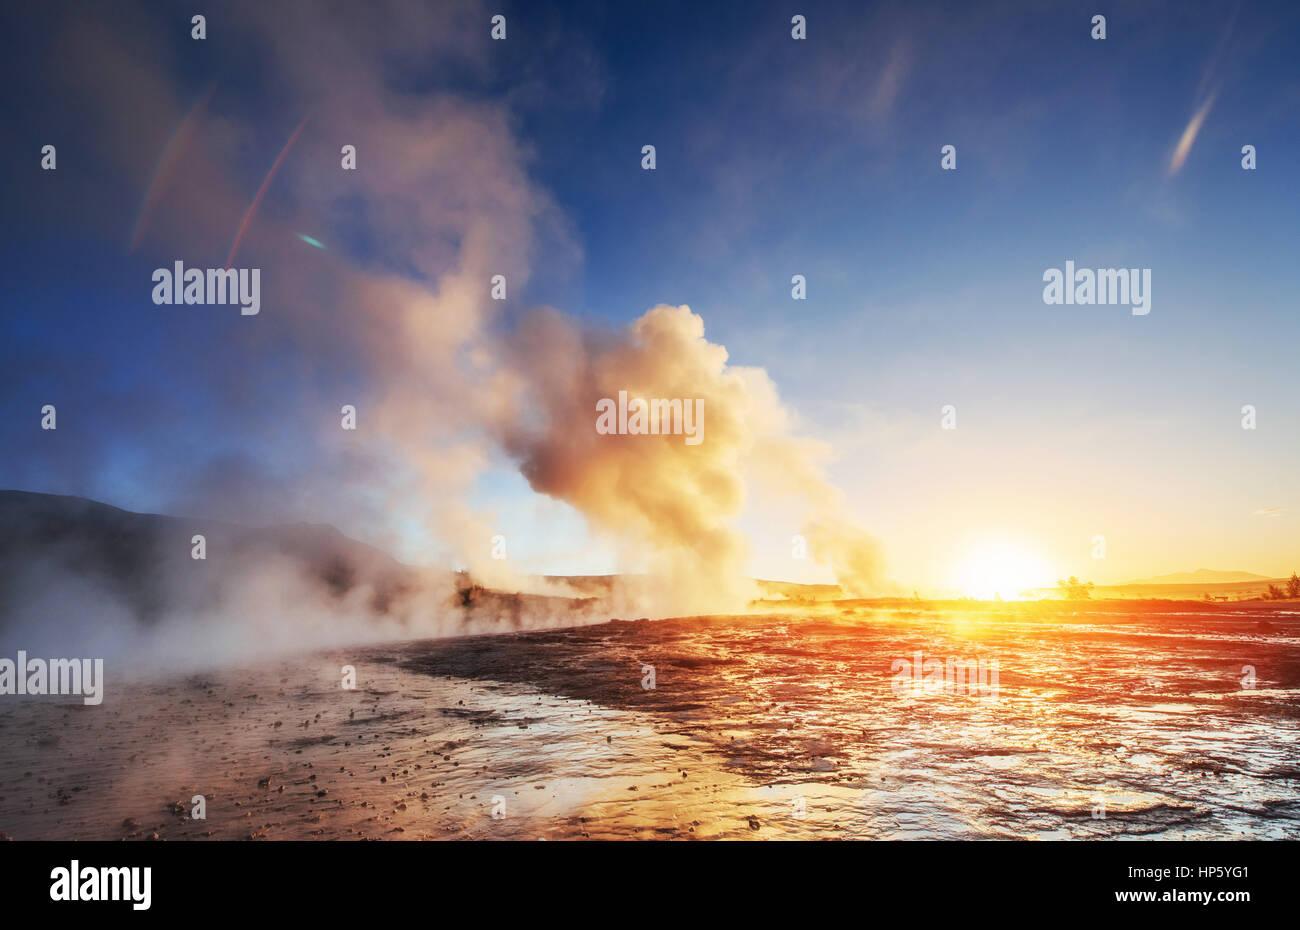 Fantastic sunset Strokkur geyser eruption in Iceland - Stock Image